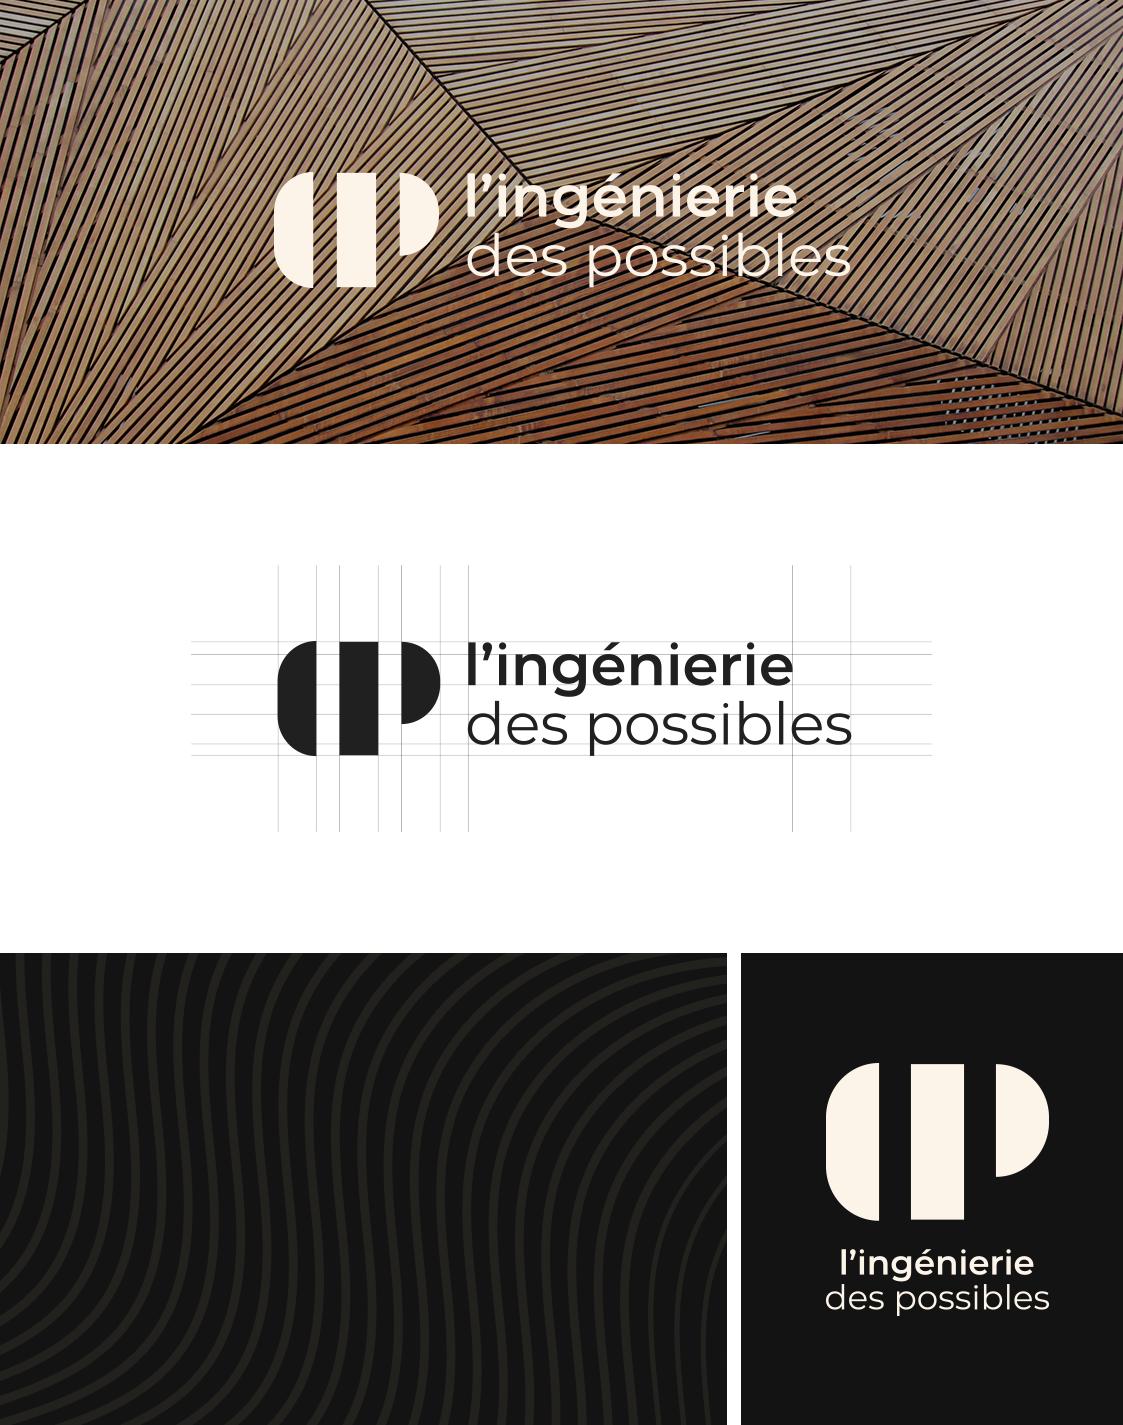 logo ingénierie des possibles Freyja portfolio